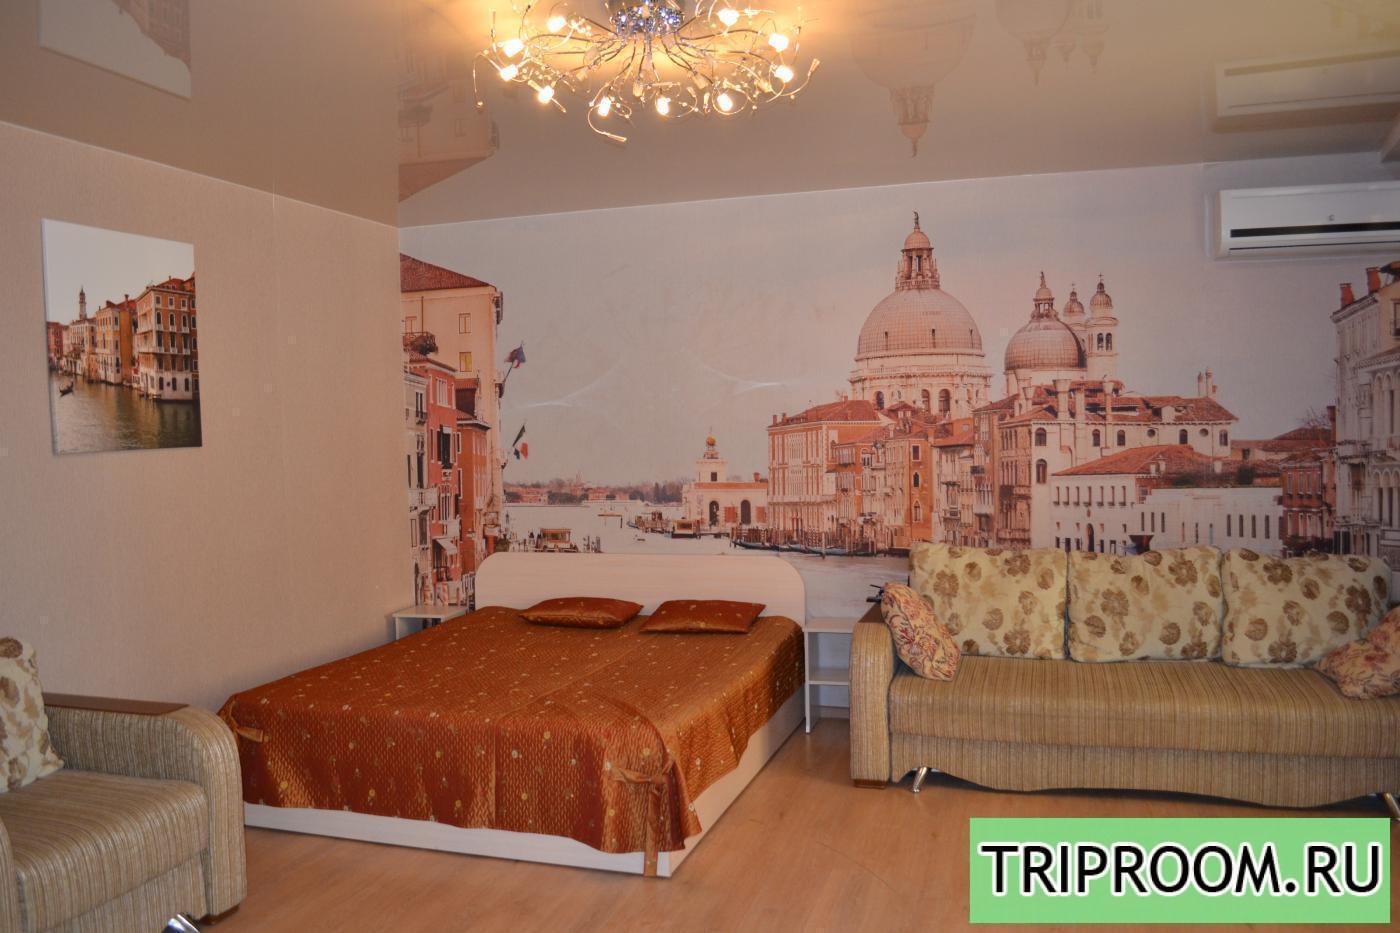 1-комнатная квартира посуточно (вариант № 591), ул. Революции проспект, фото № 1